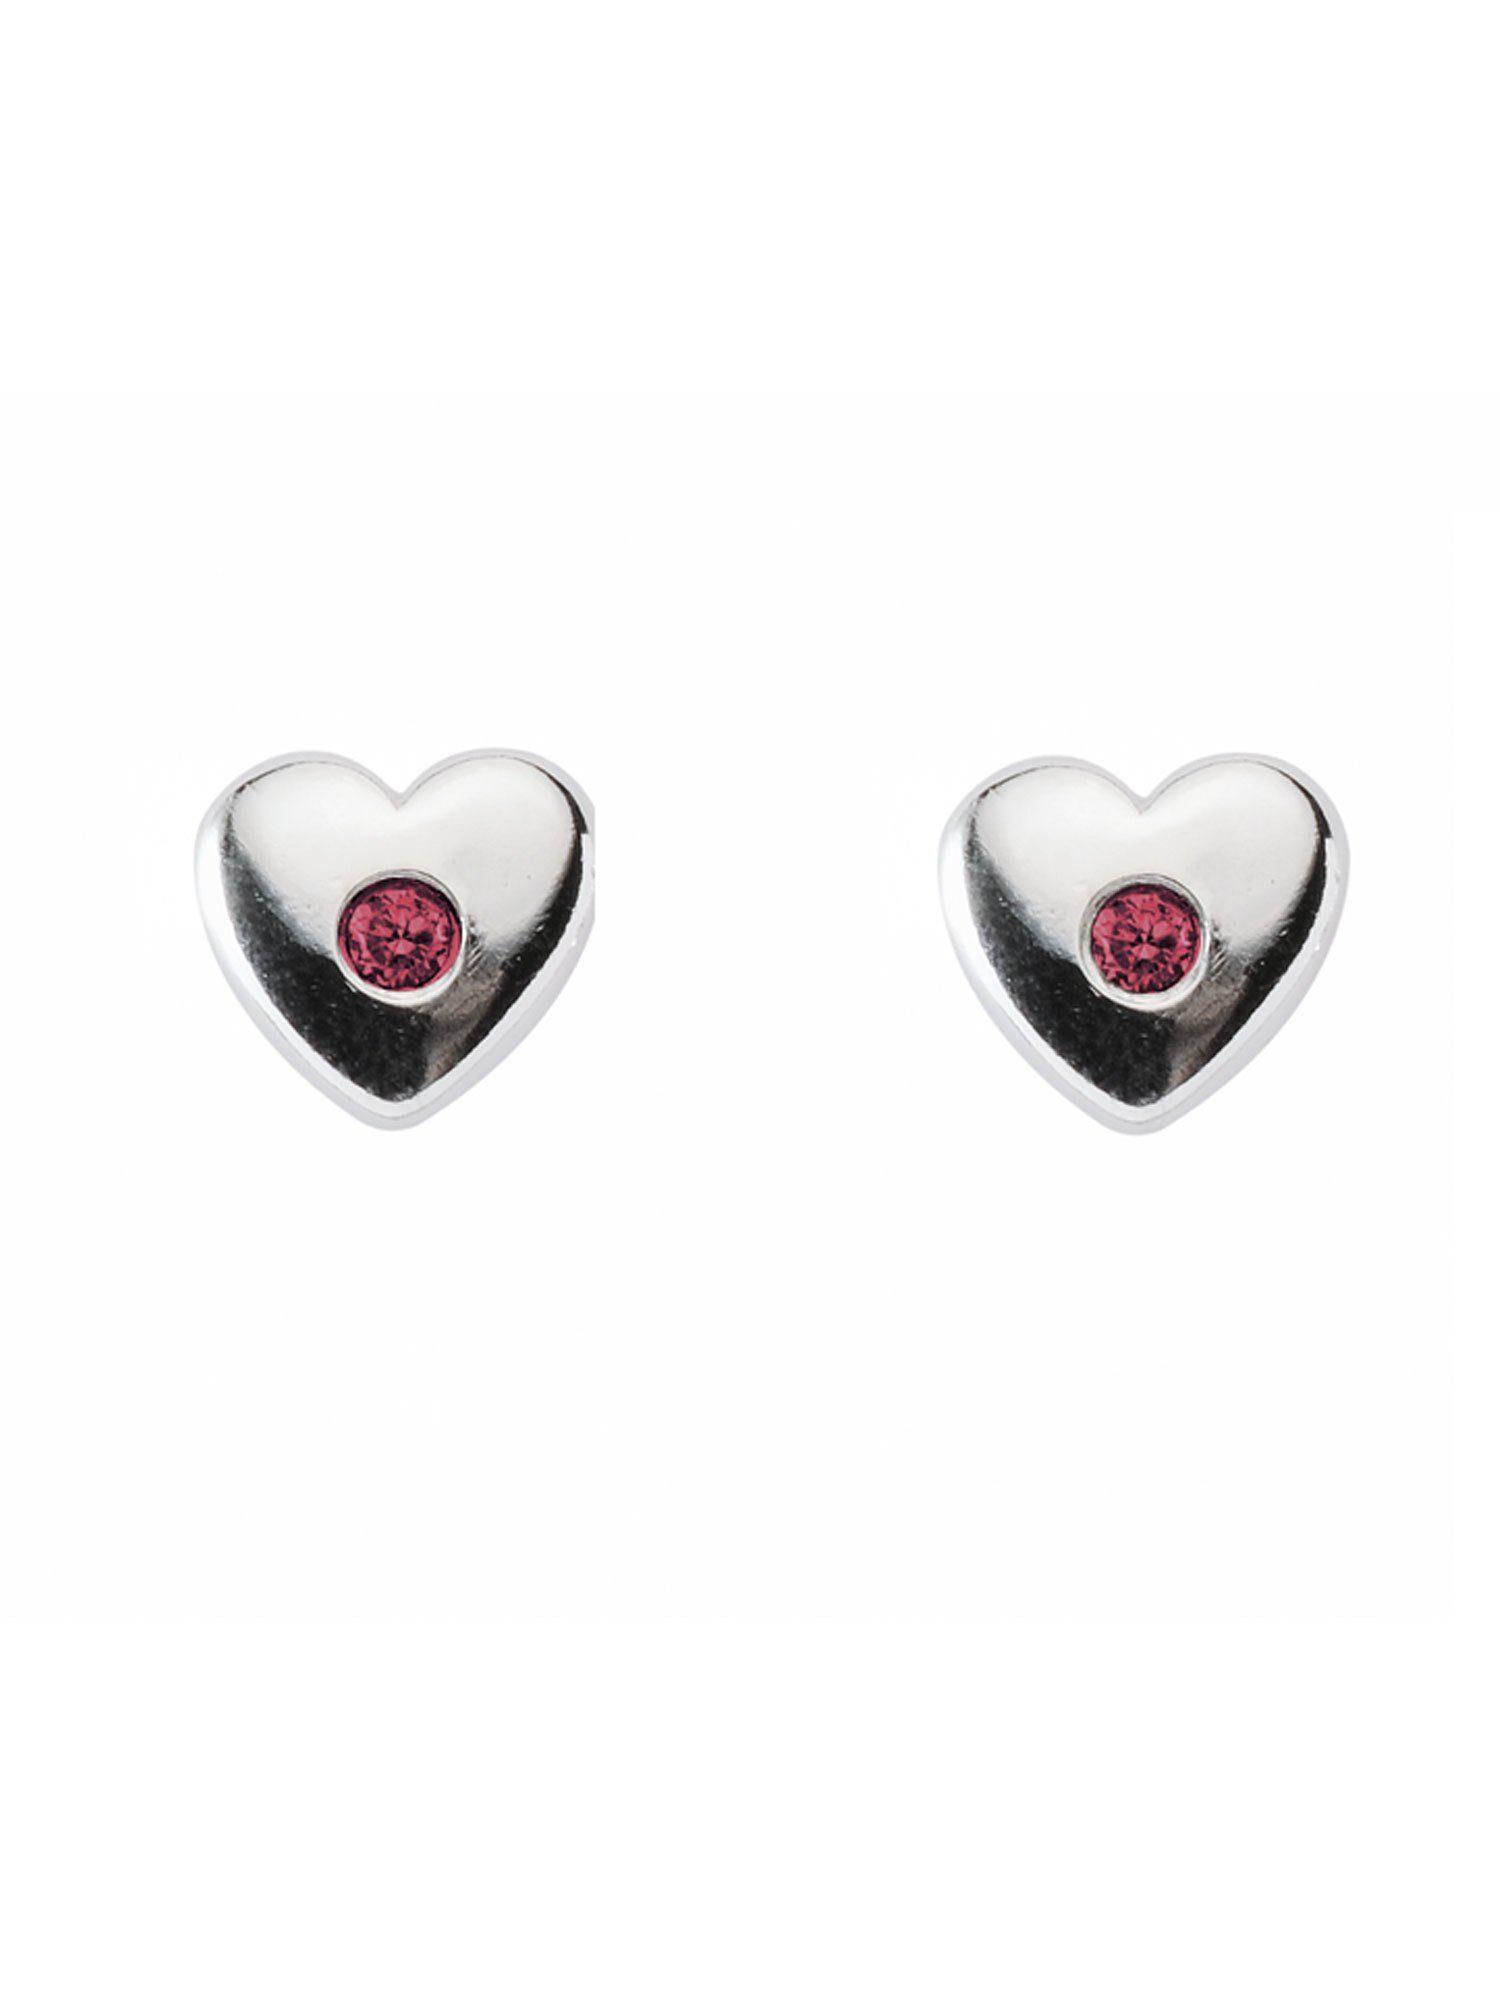 Adelia´s Paar Ohrstecker »Silber Ohrringe« Herz 925 Sterling Silber mit Zirkonia